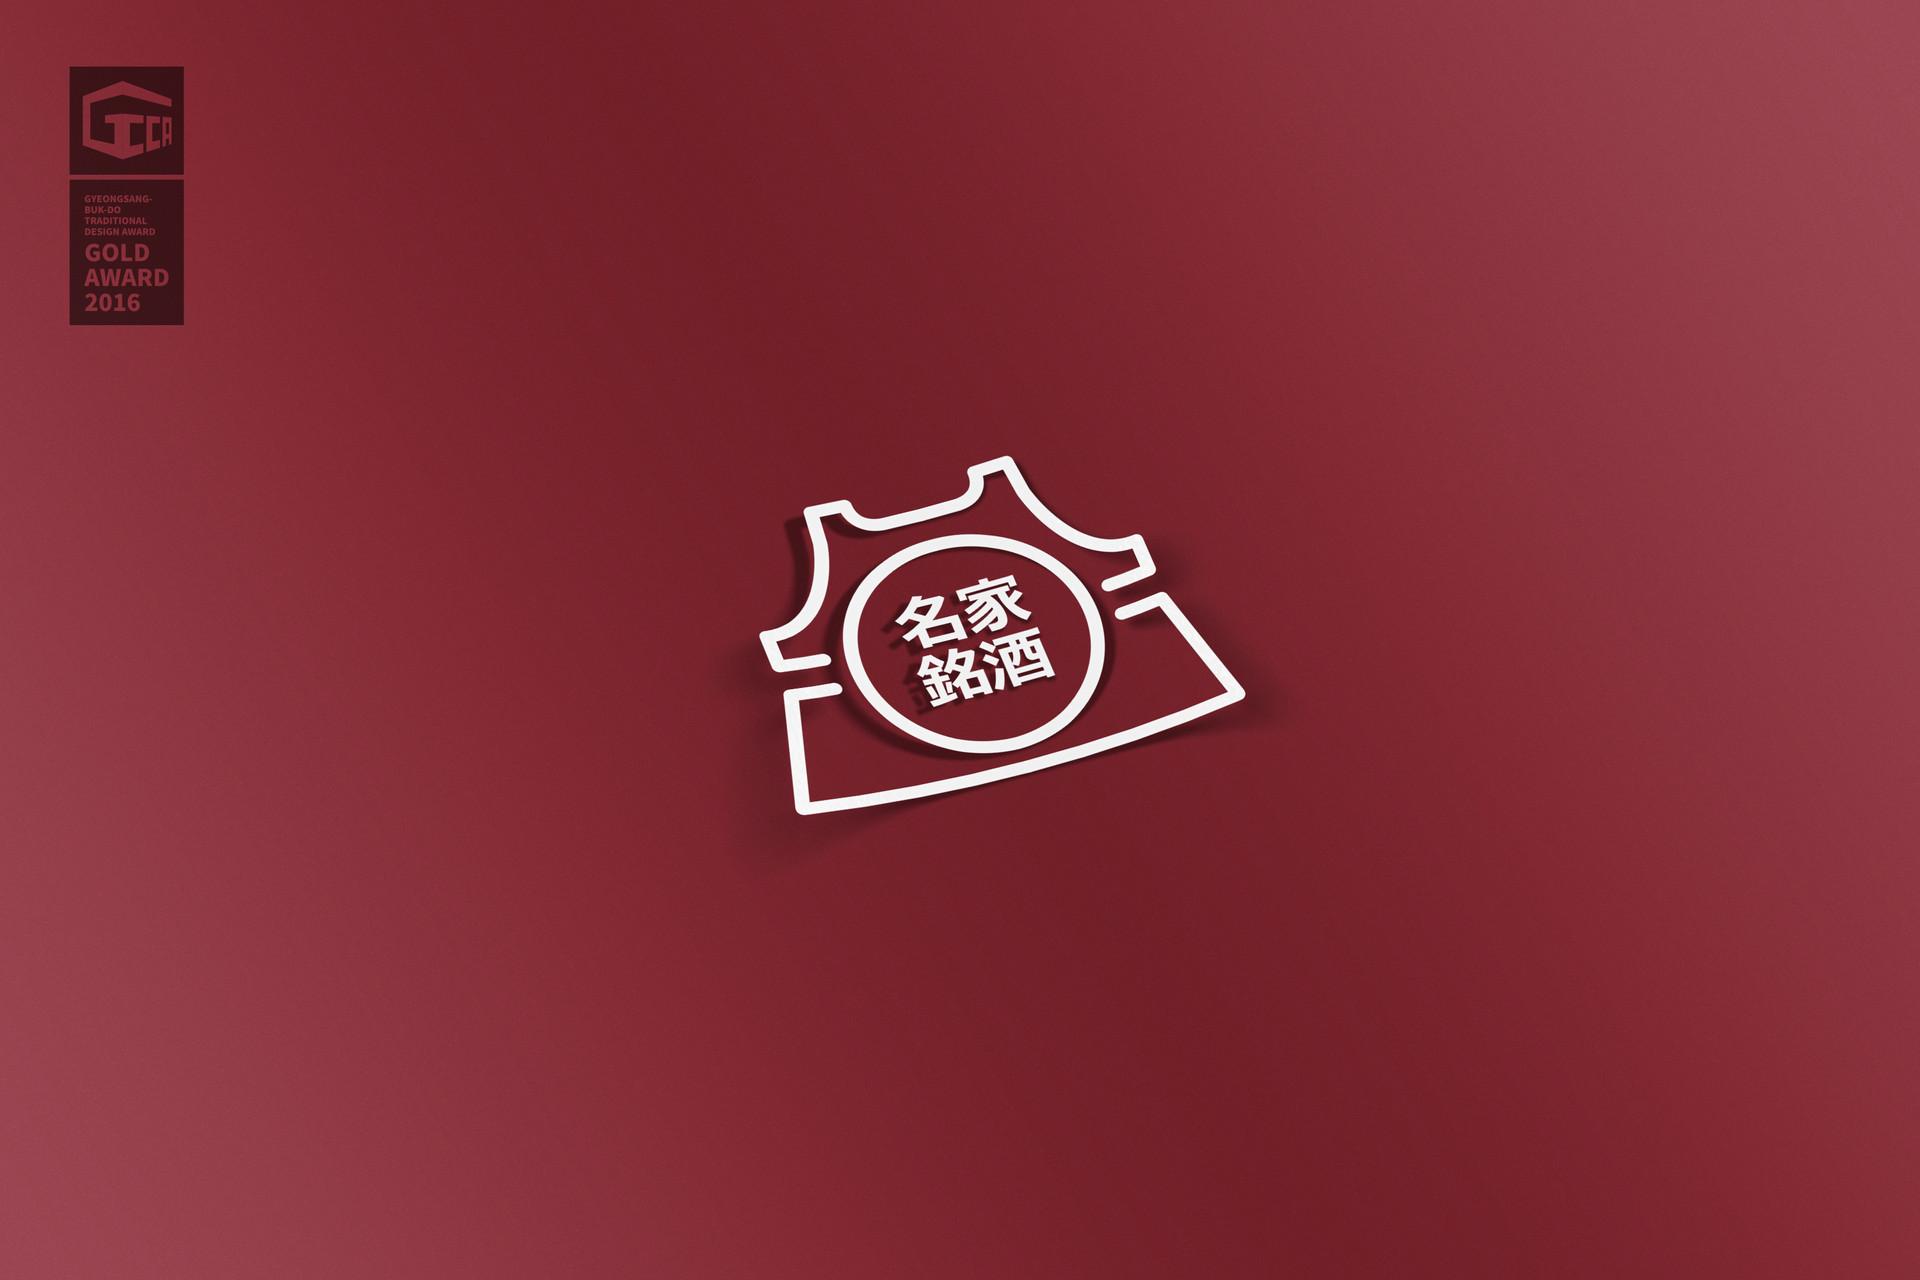 Library Sticker Mockup for Photoshop - V